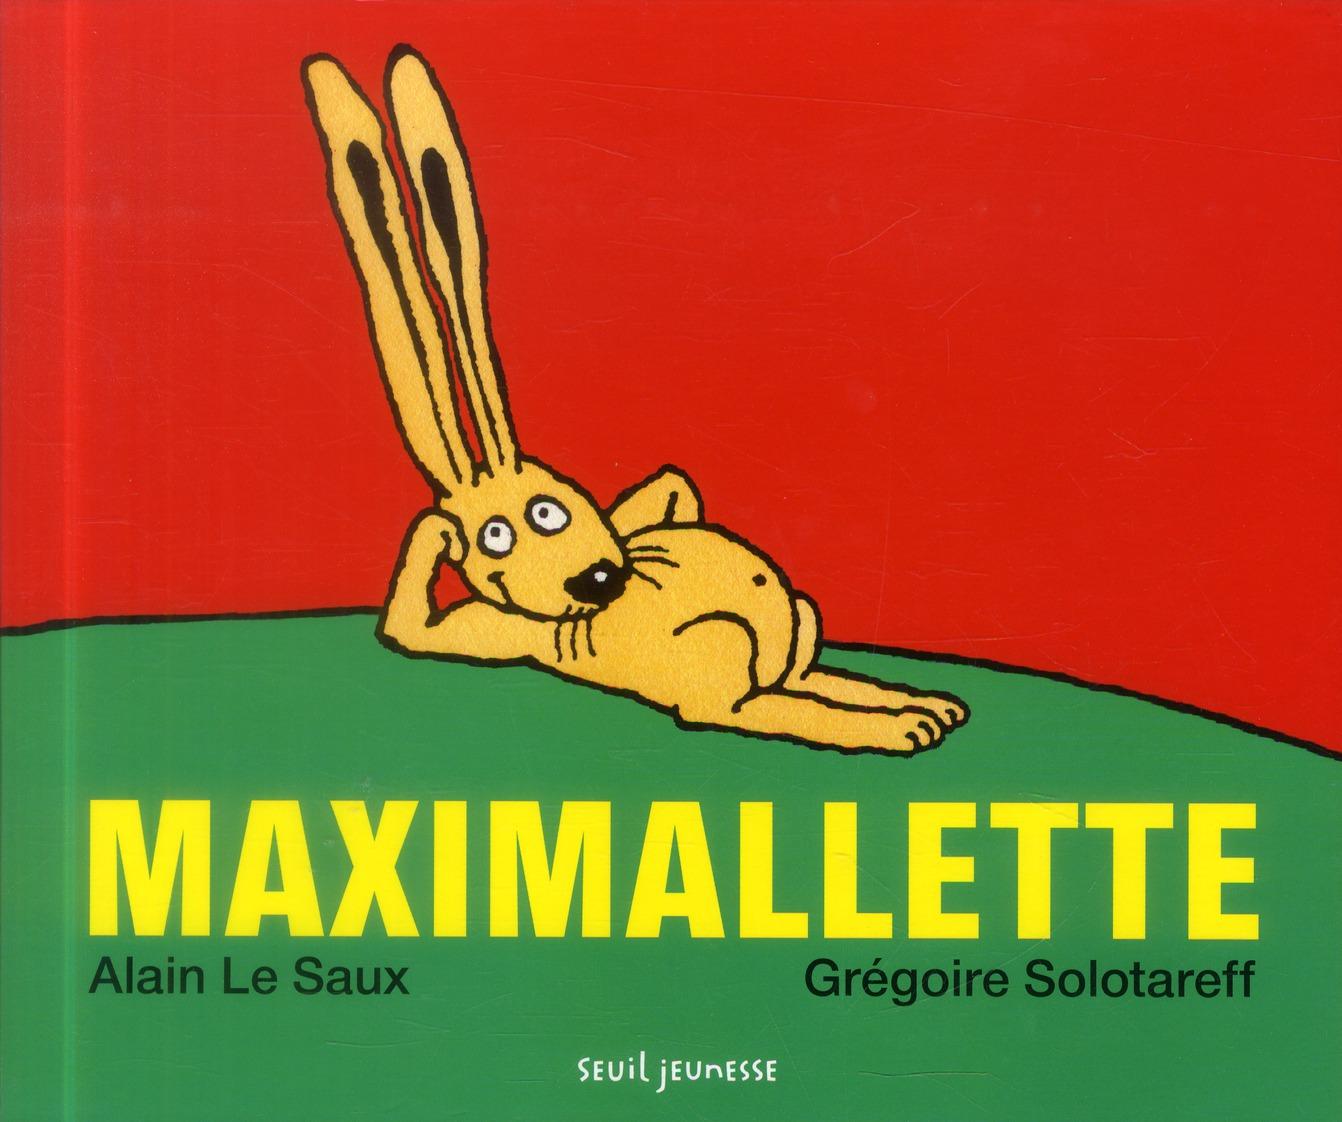 Maximalette